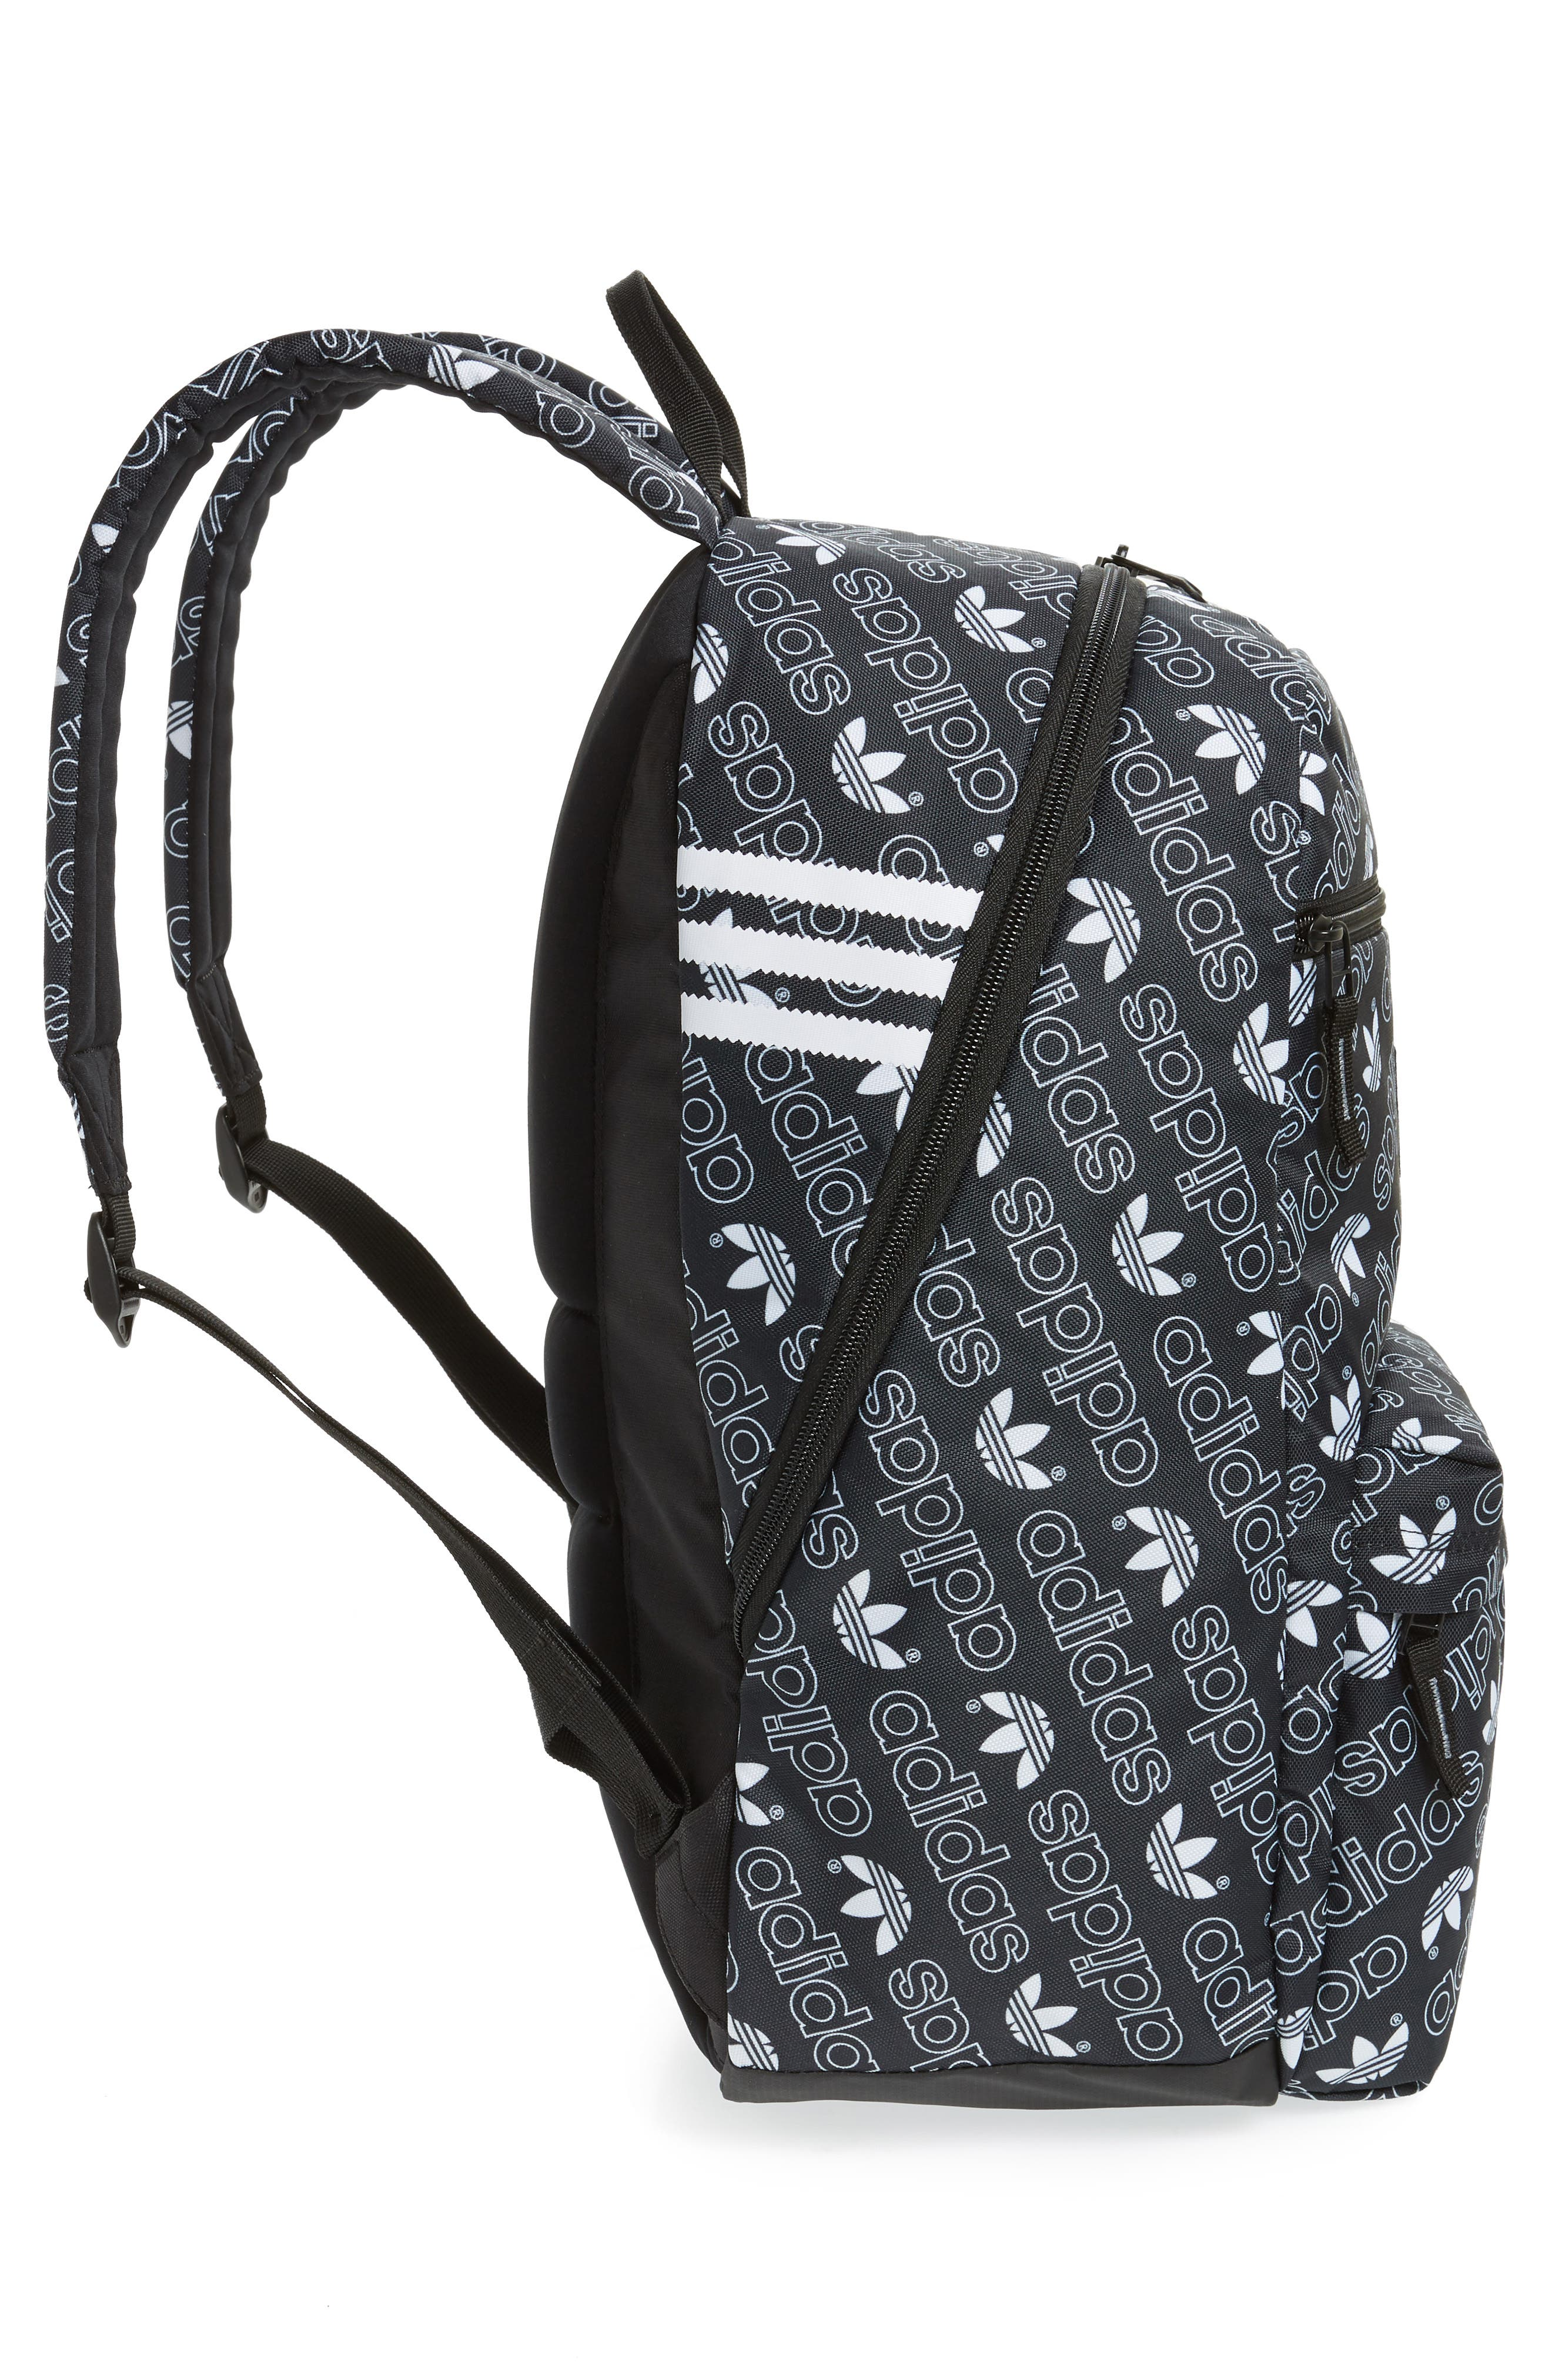 Monogram National Backpack,                             Alternate thumbnail 5, color,                             BLACK MONOGRAM